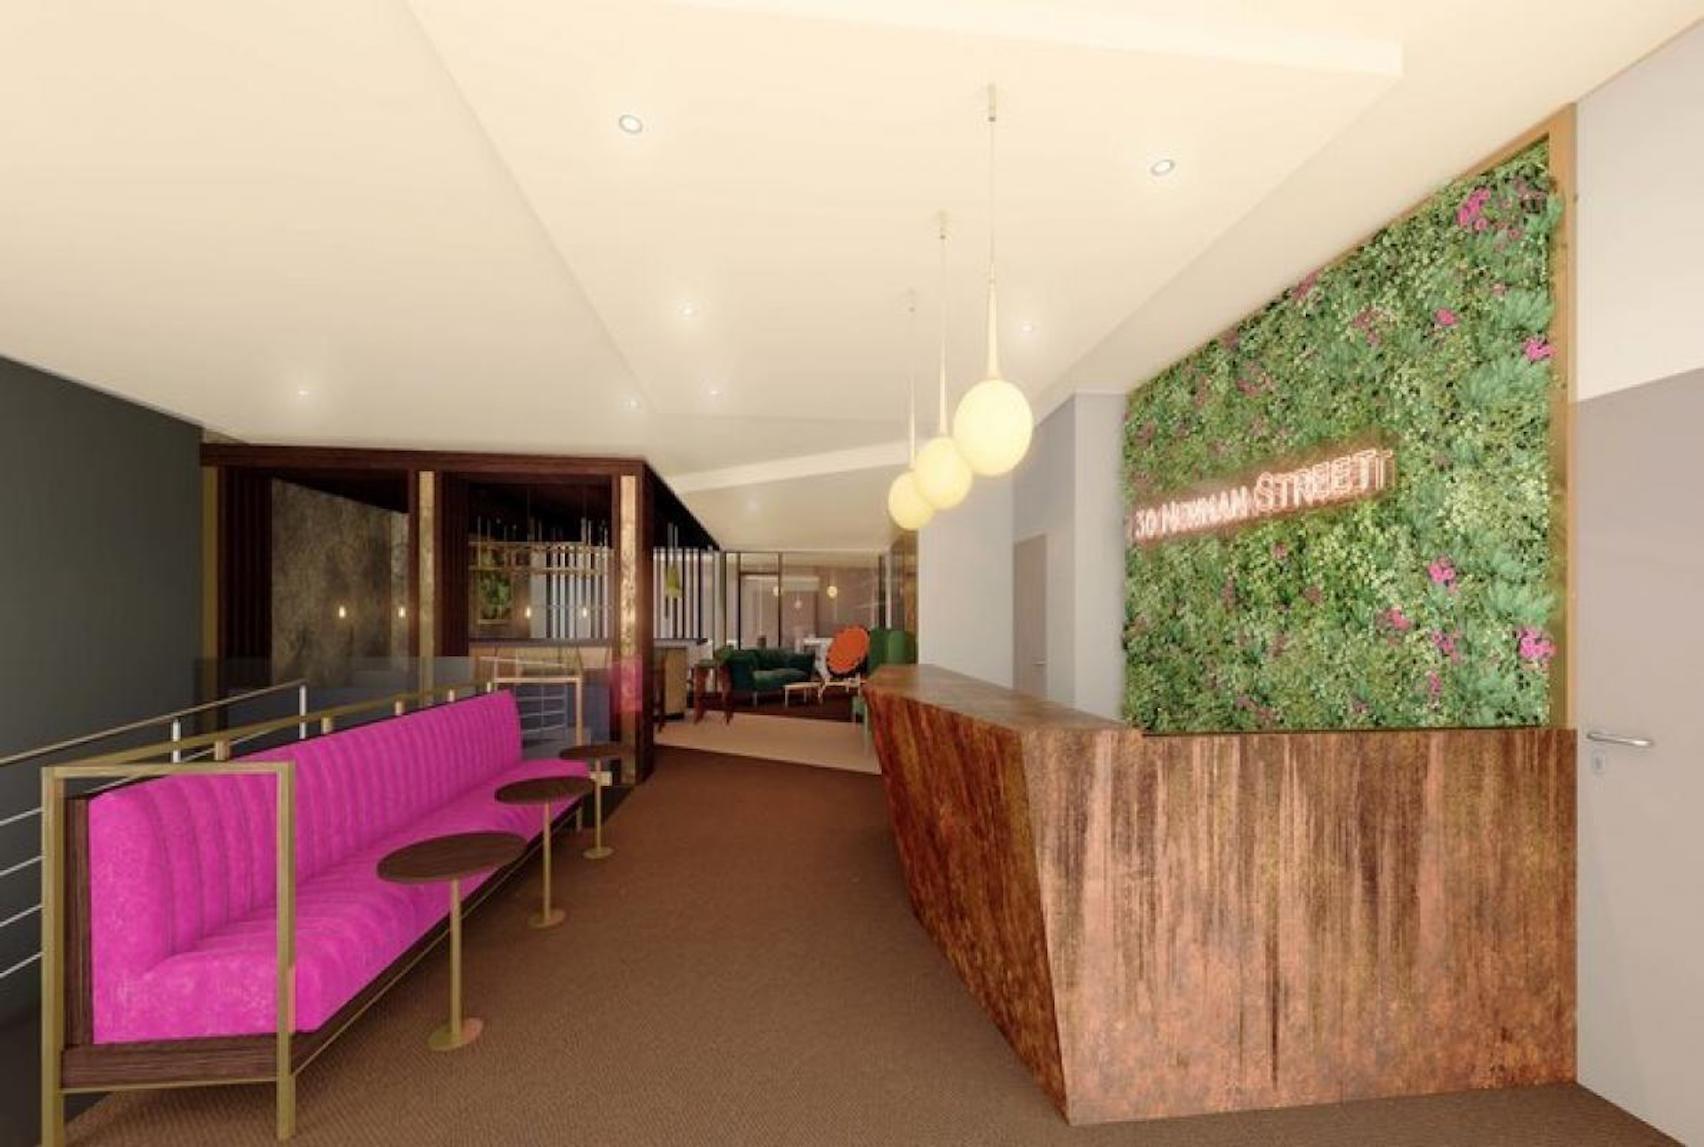 Oxford Meeting Room, Landmark - Newman Street, London